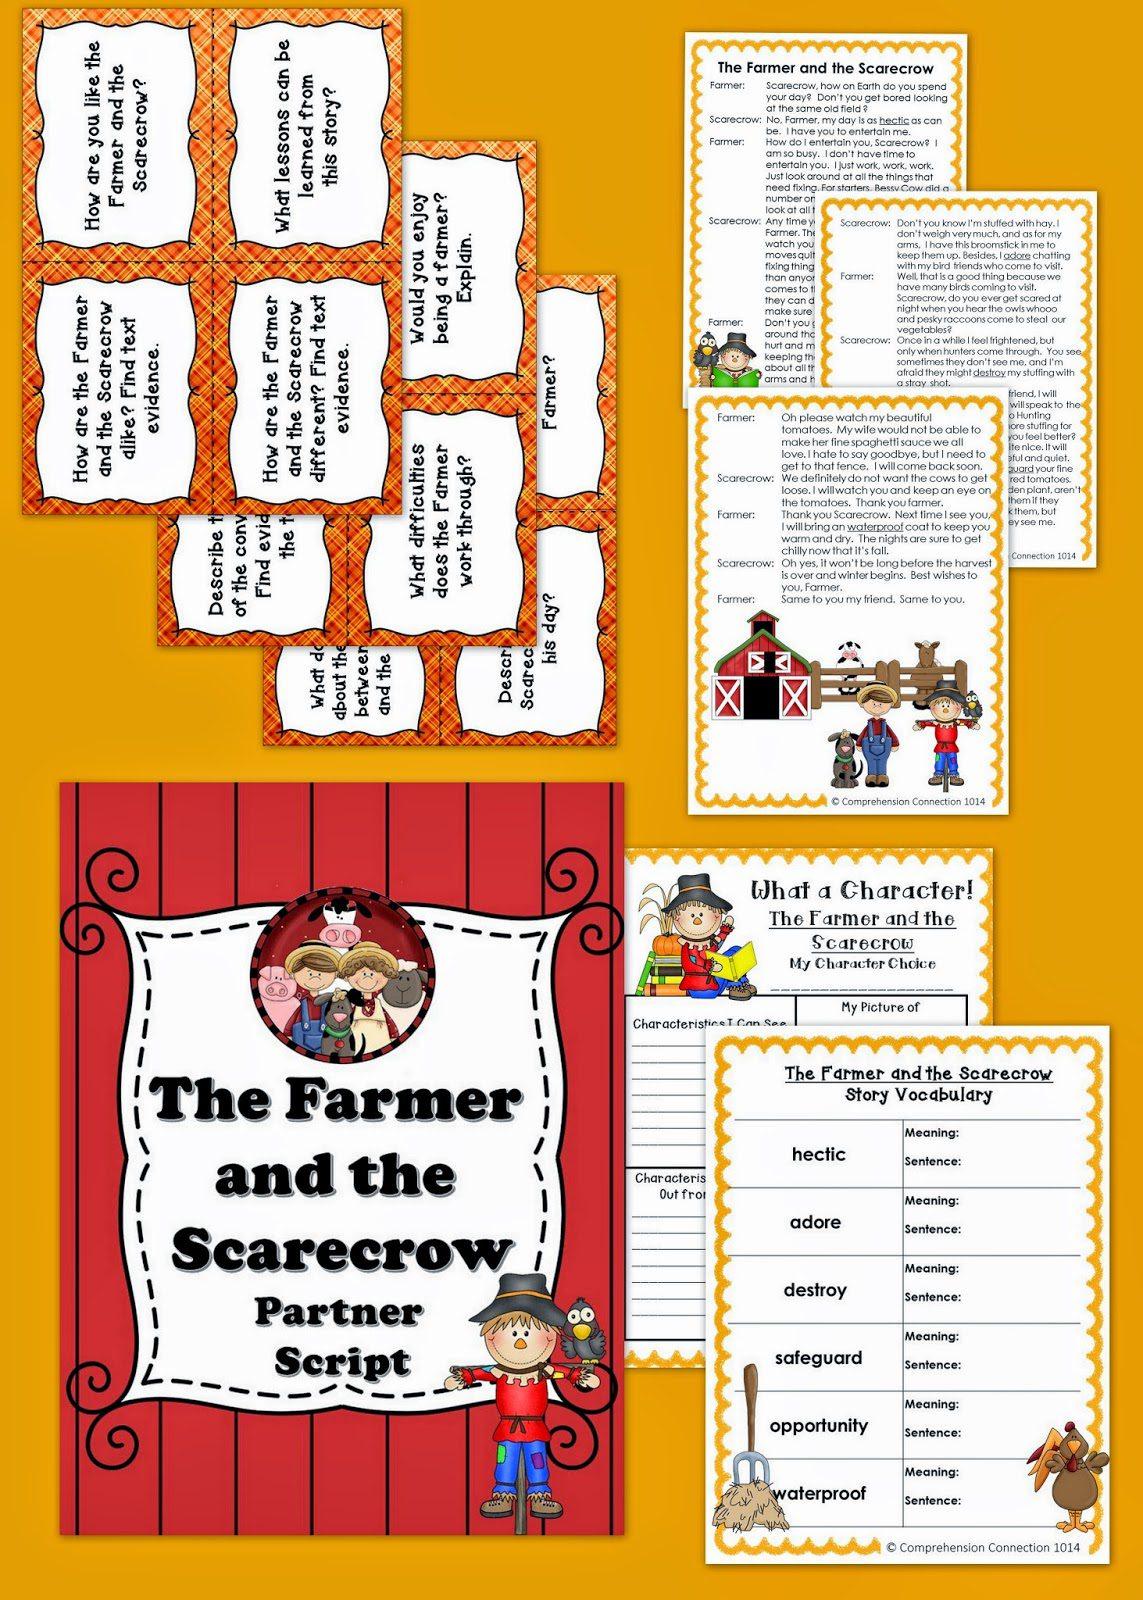 scarecrow2bpartner2bscript-9481742